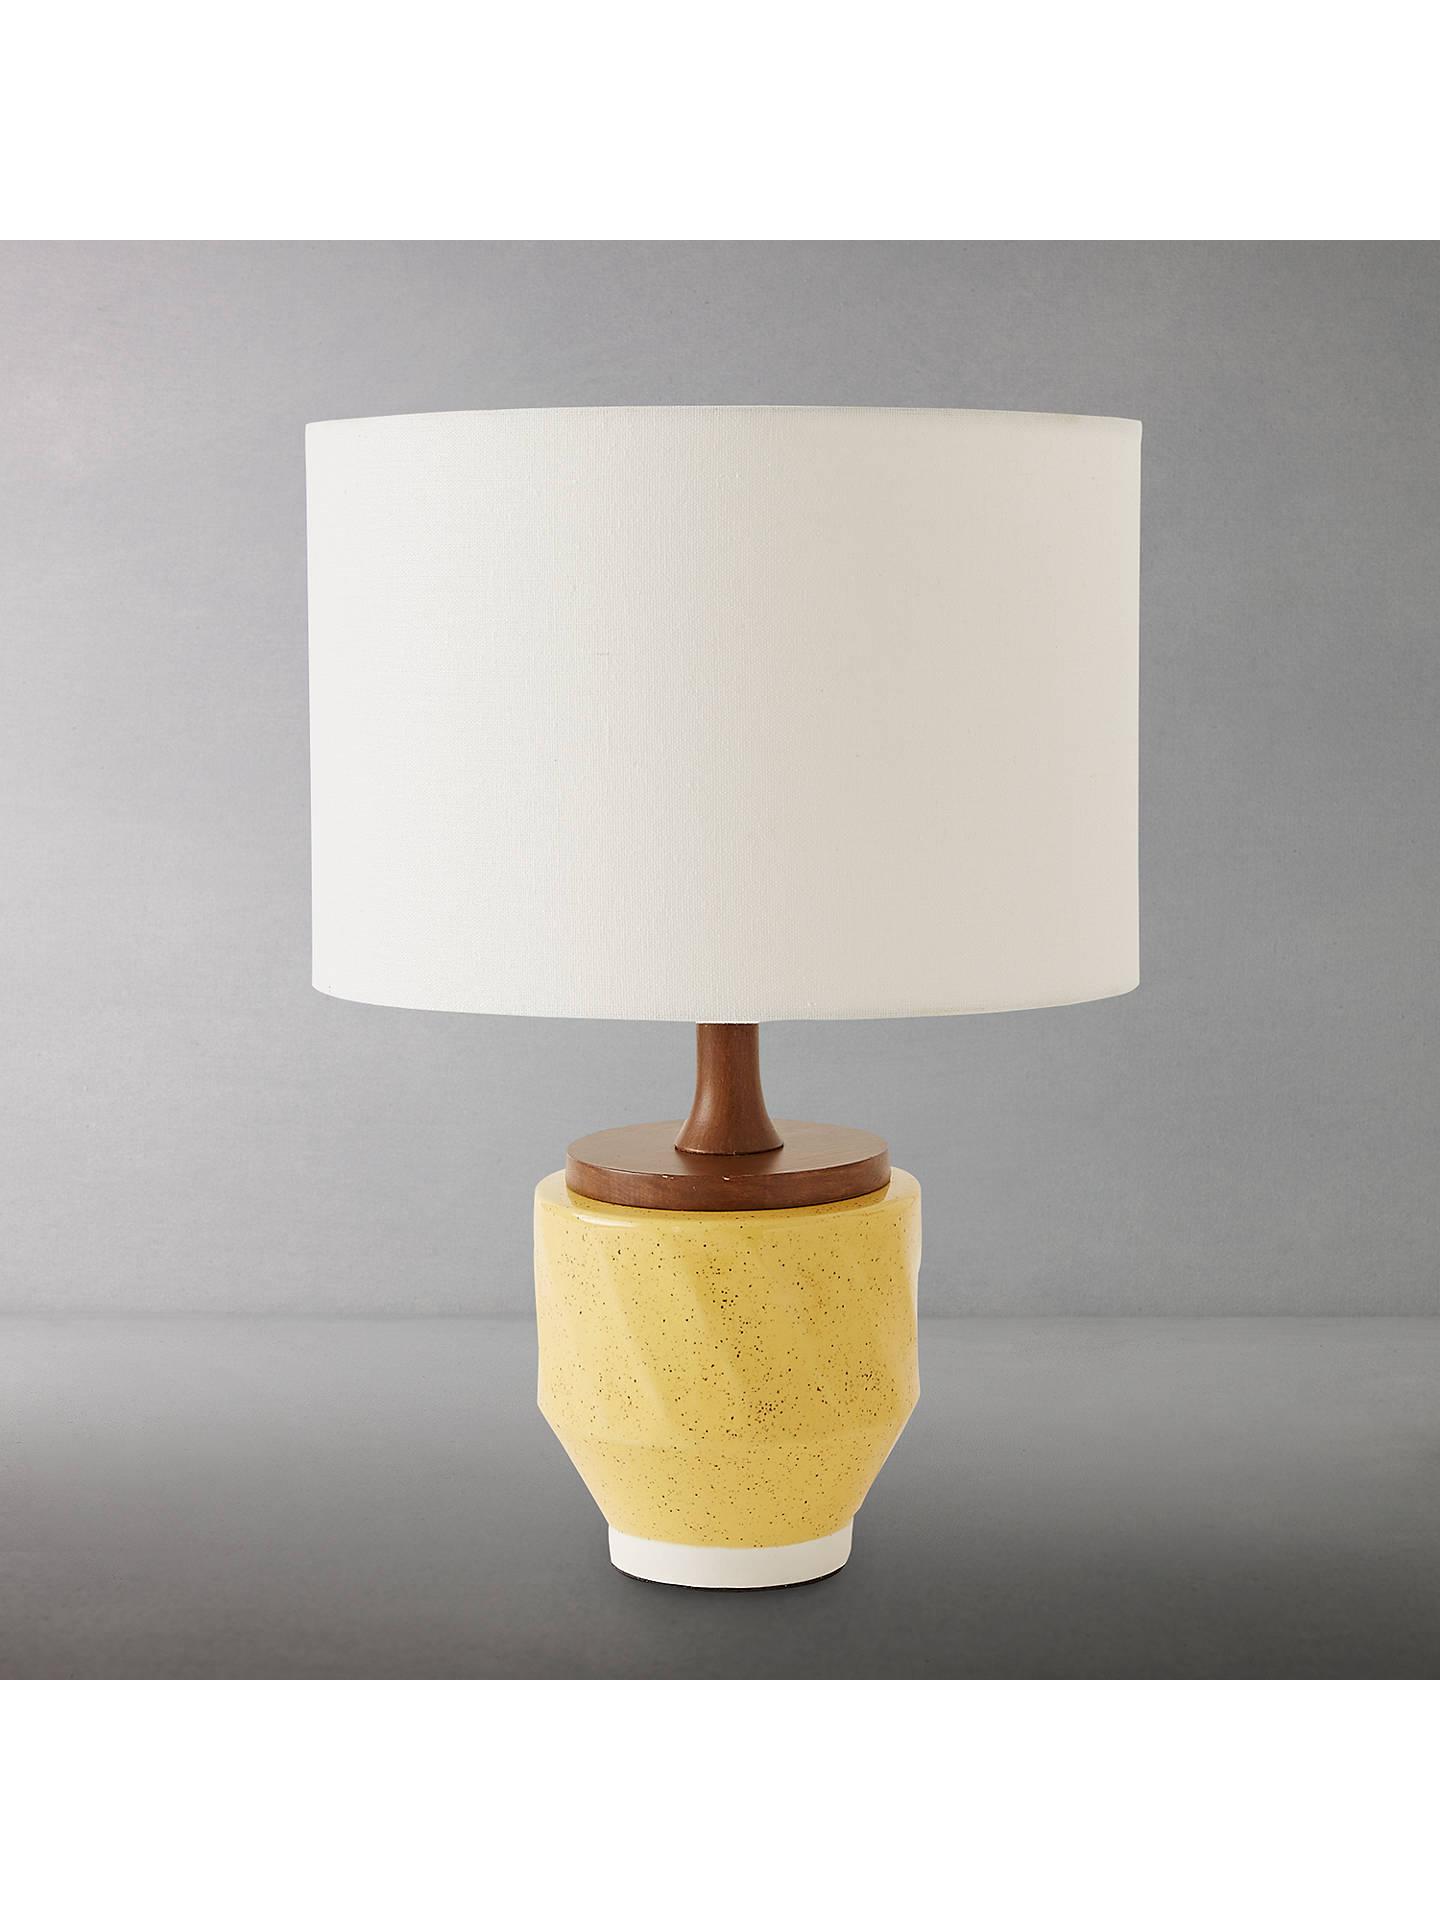 Roar Rabbit For West Elm Ripple Large Ceramic Table Lamp